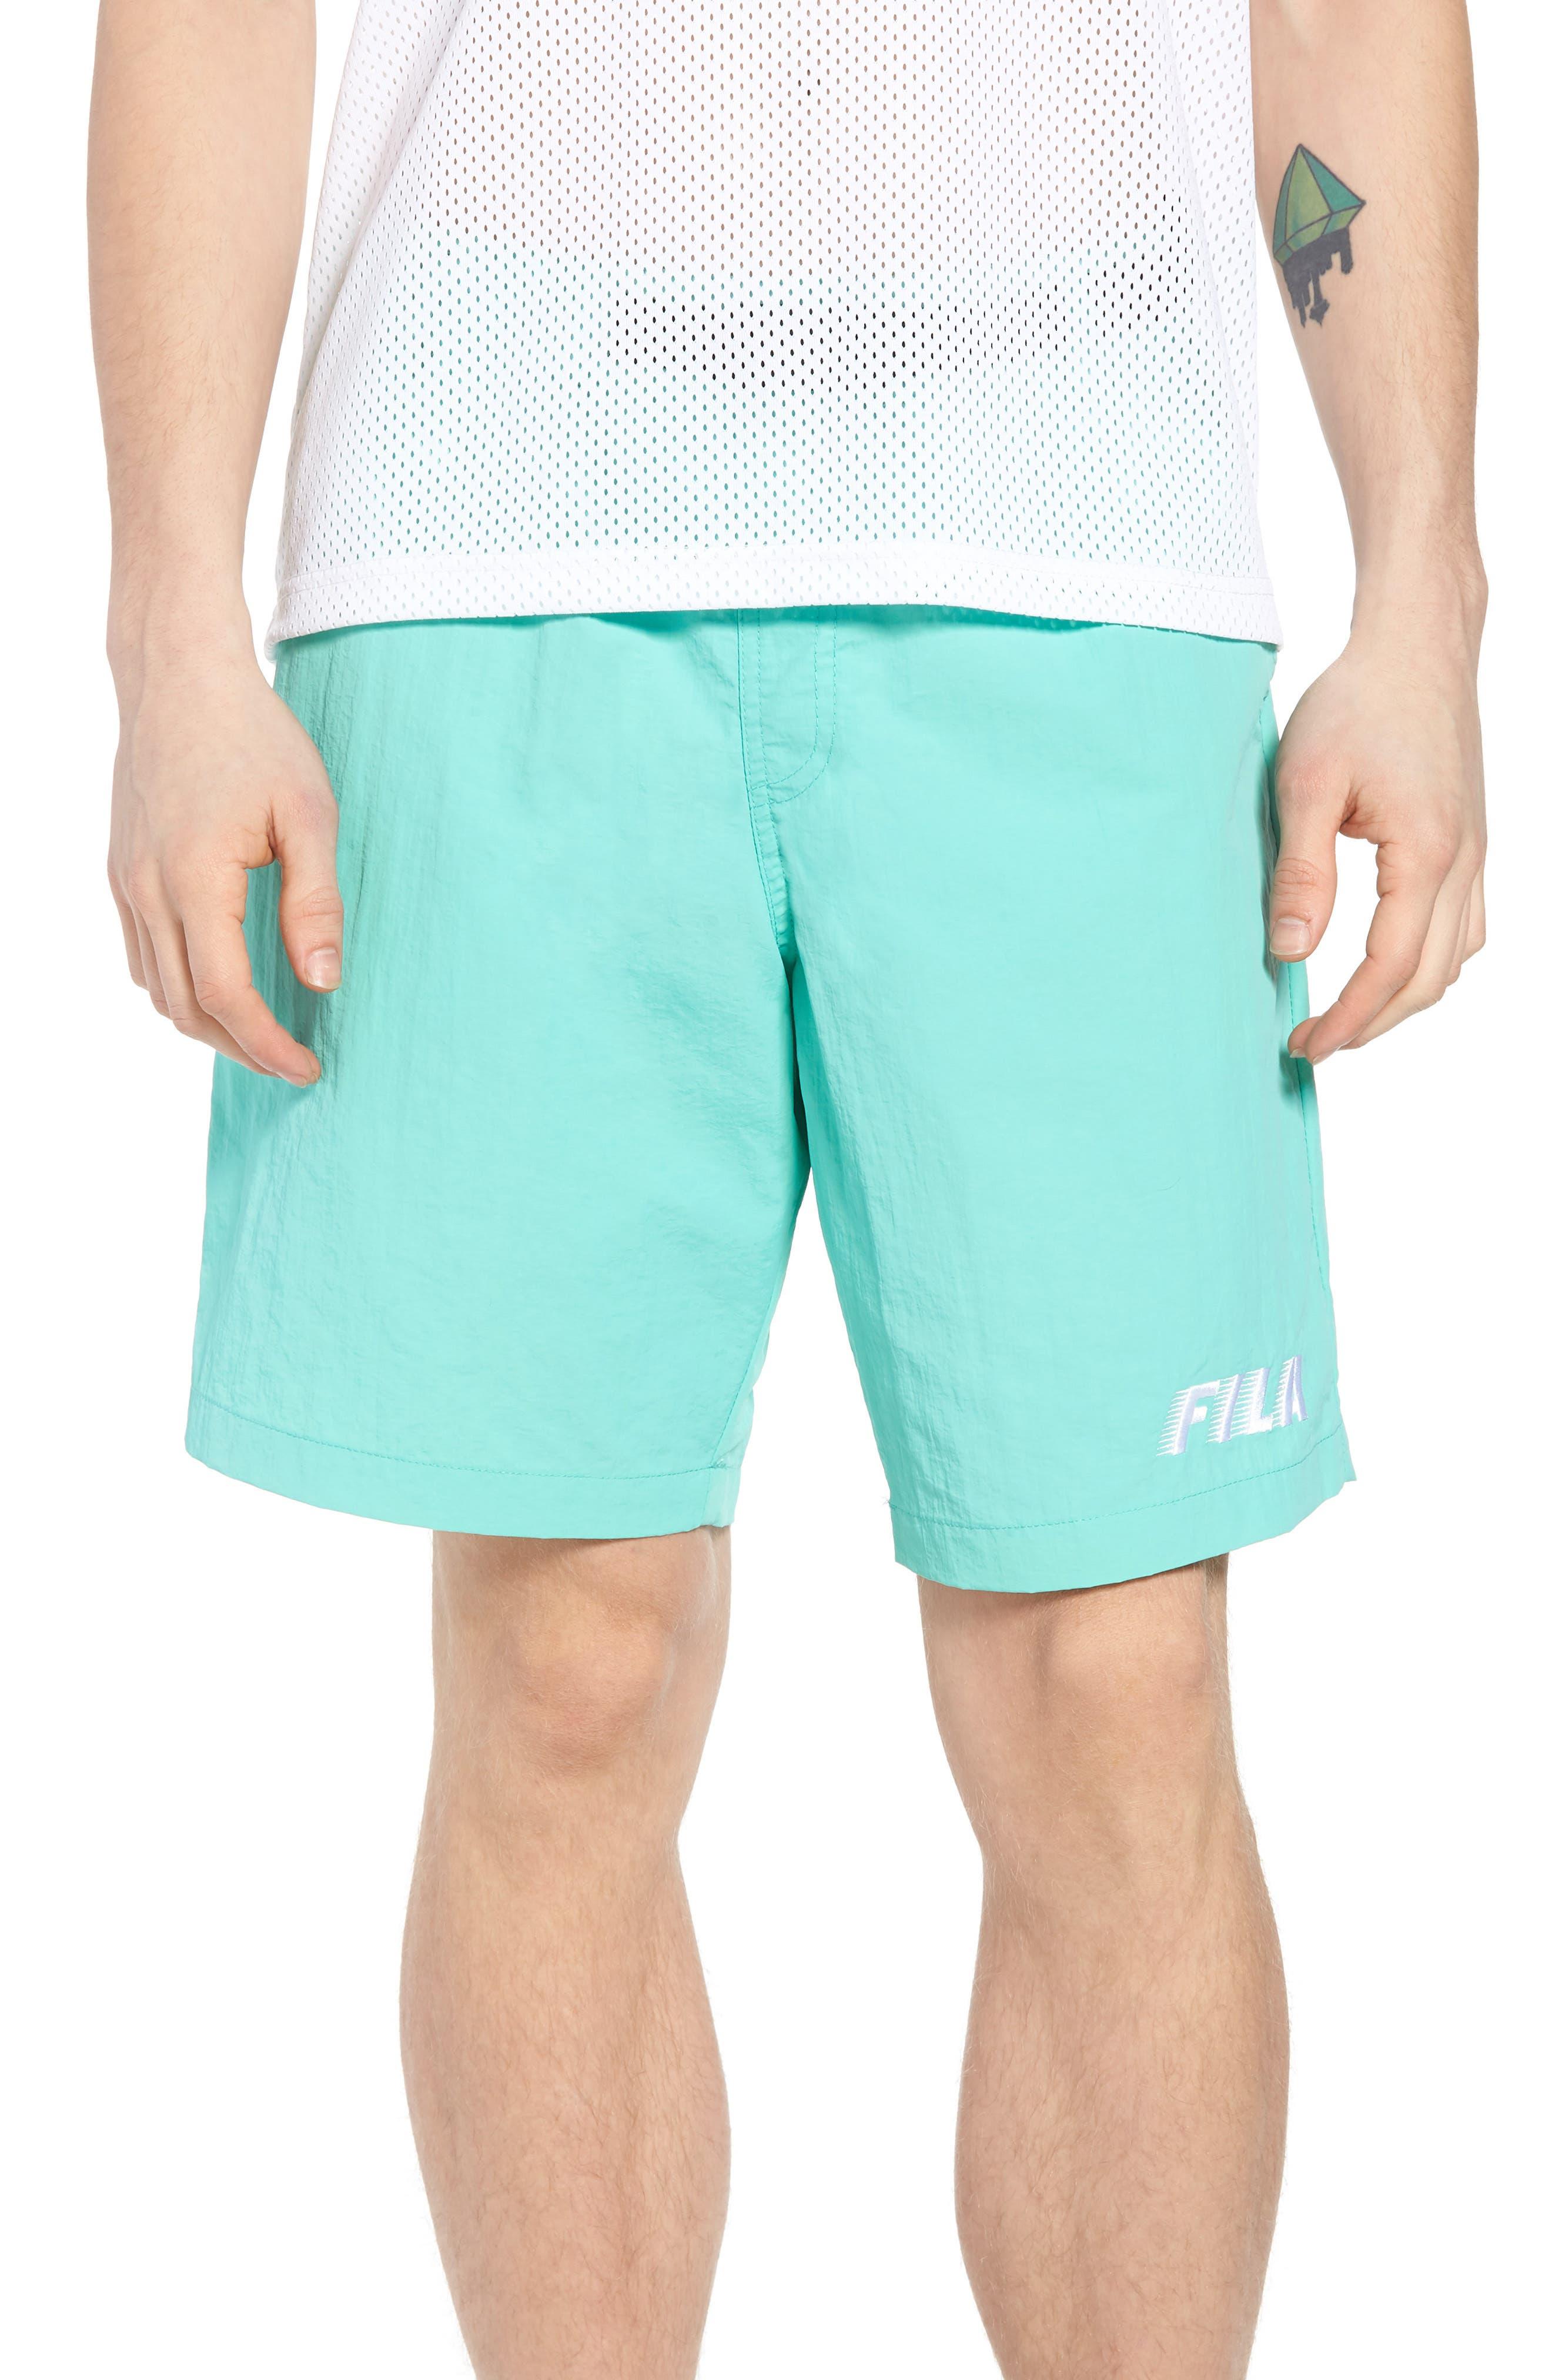 Mondy Shorts,                             Main thumbnail 2, color,